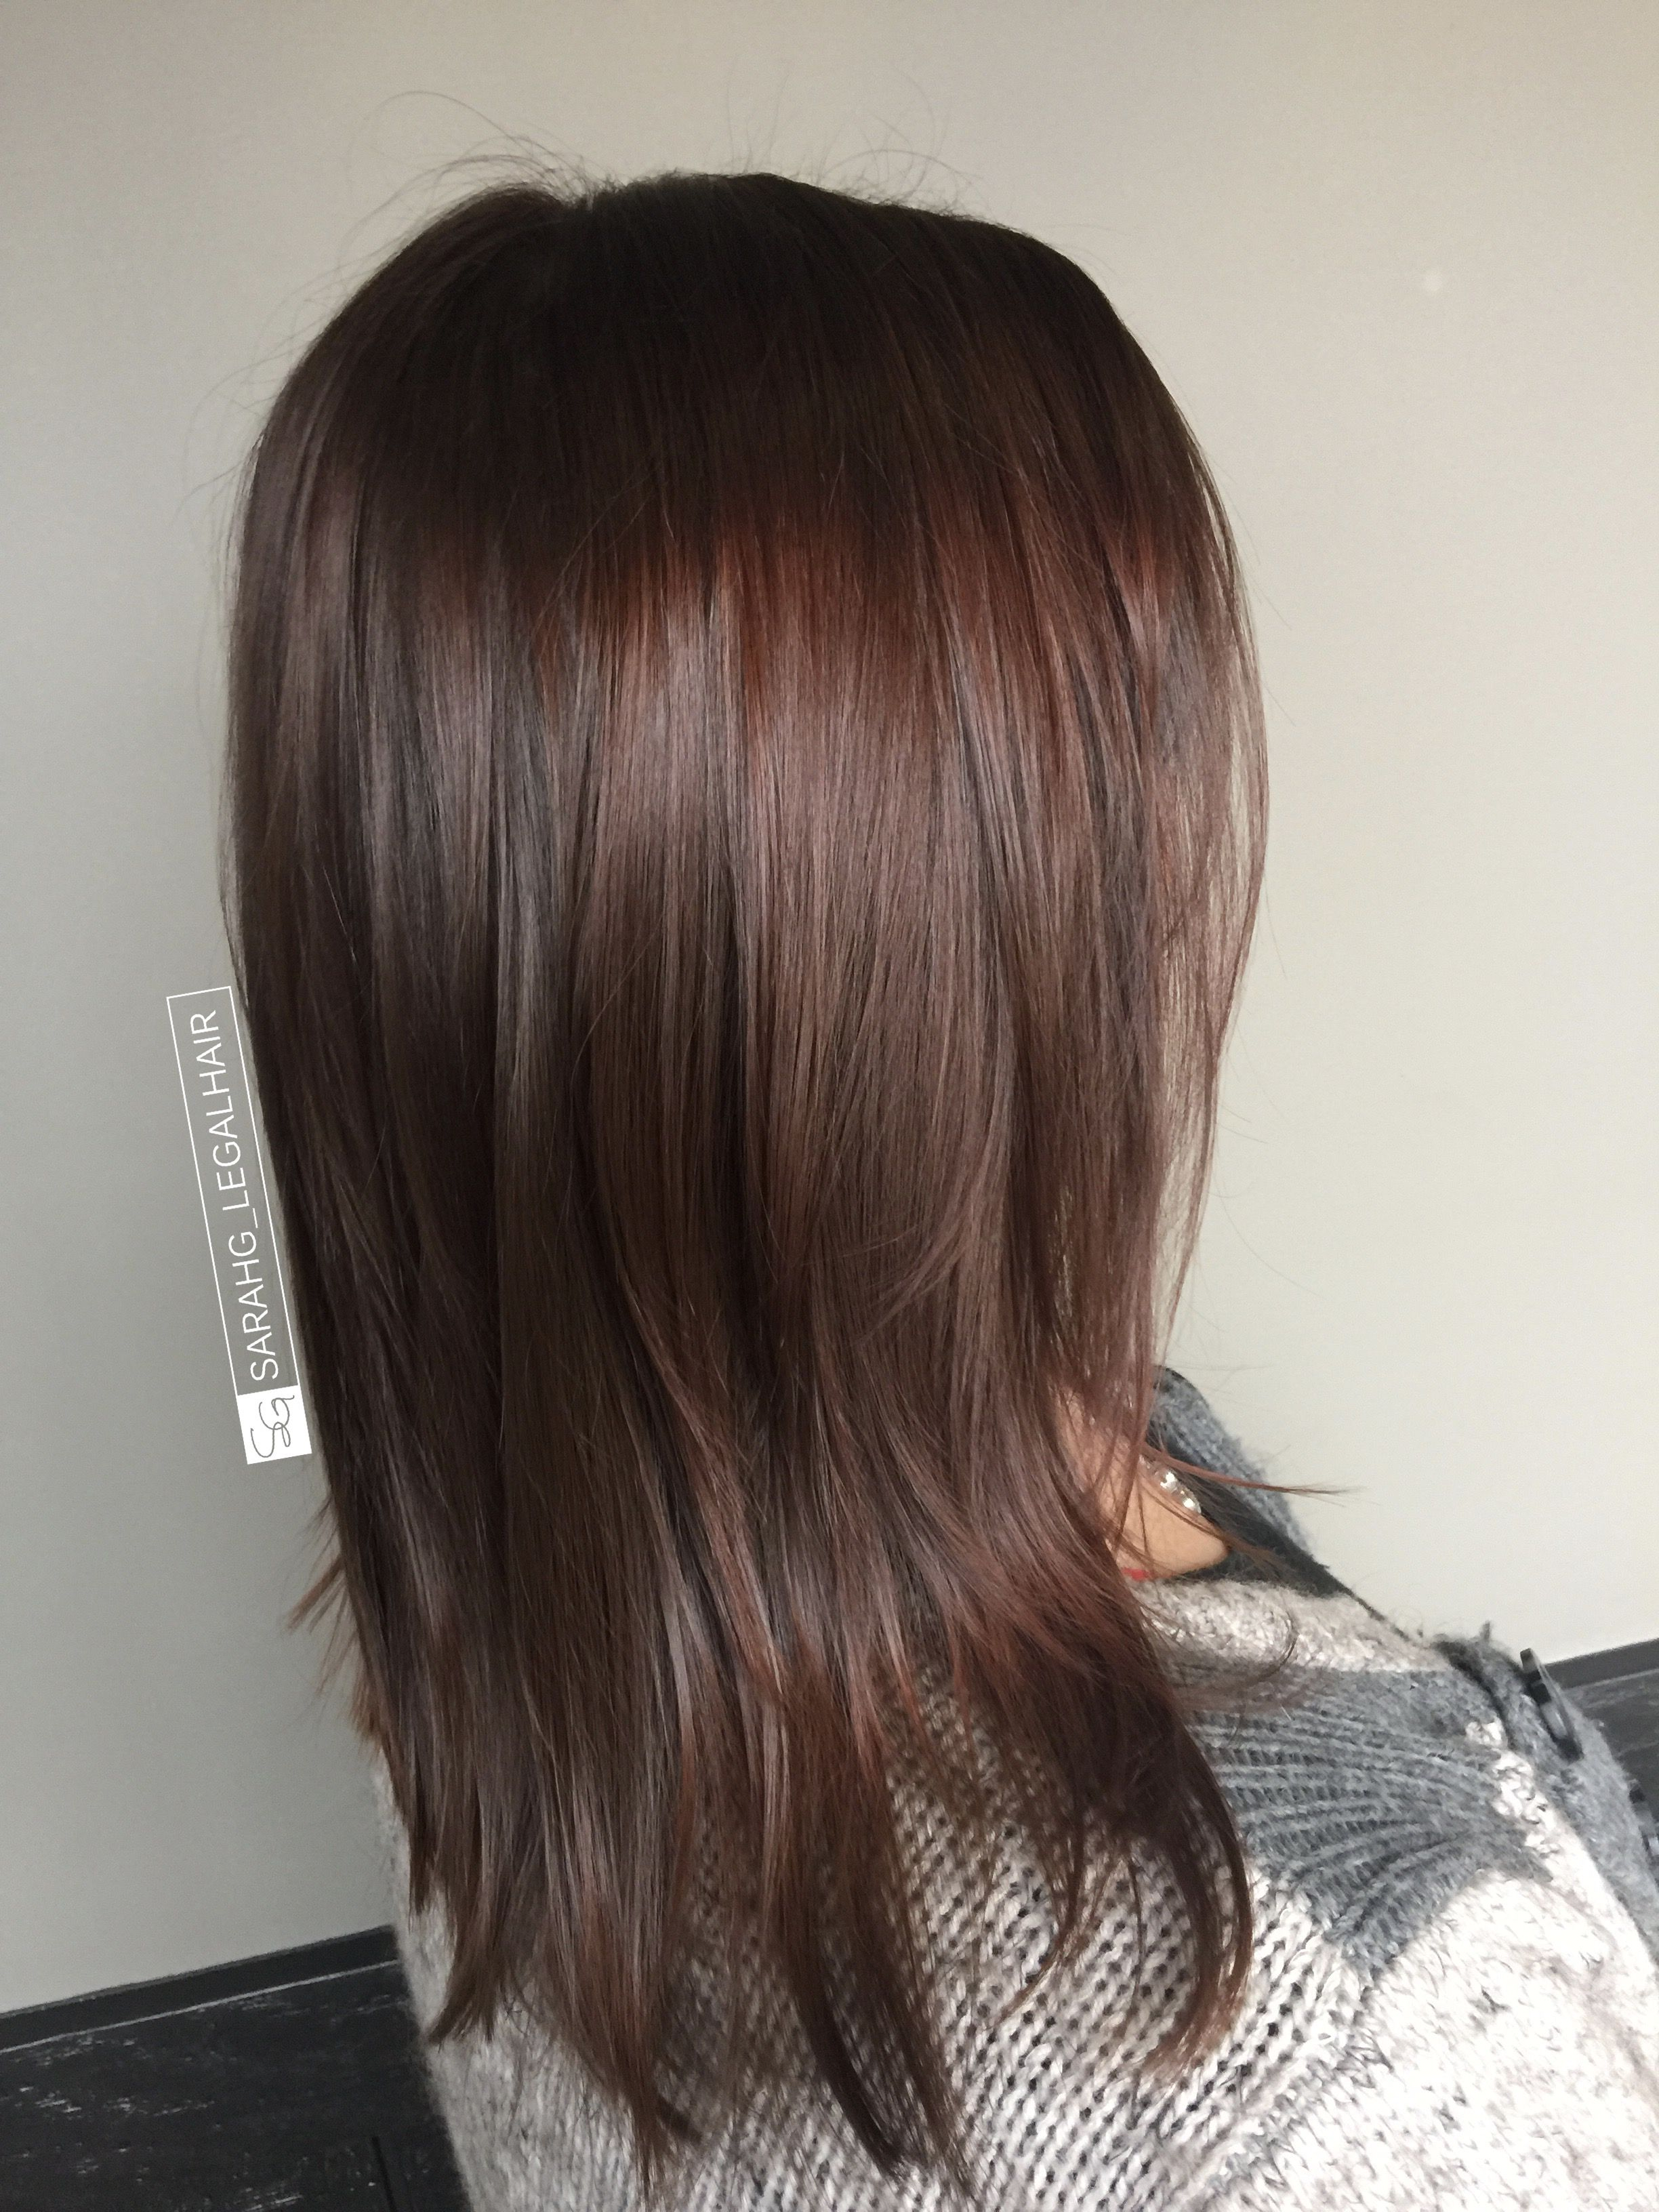 Rich Cinnamon Brown And Dark Chocolate Deep Hair Color Redken Shades Eq